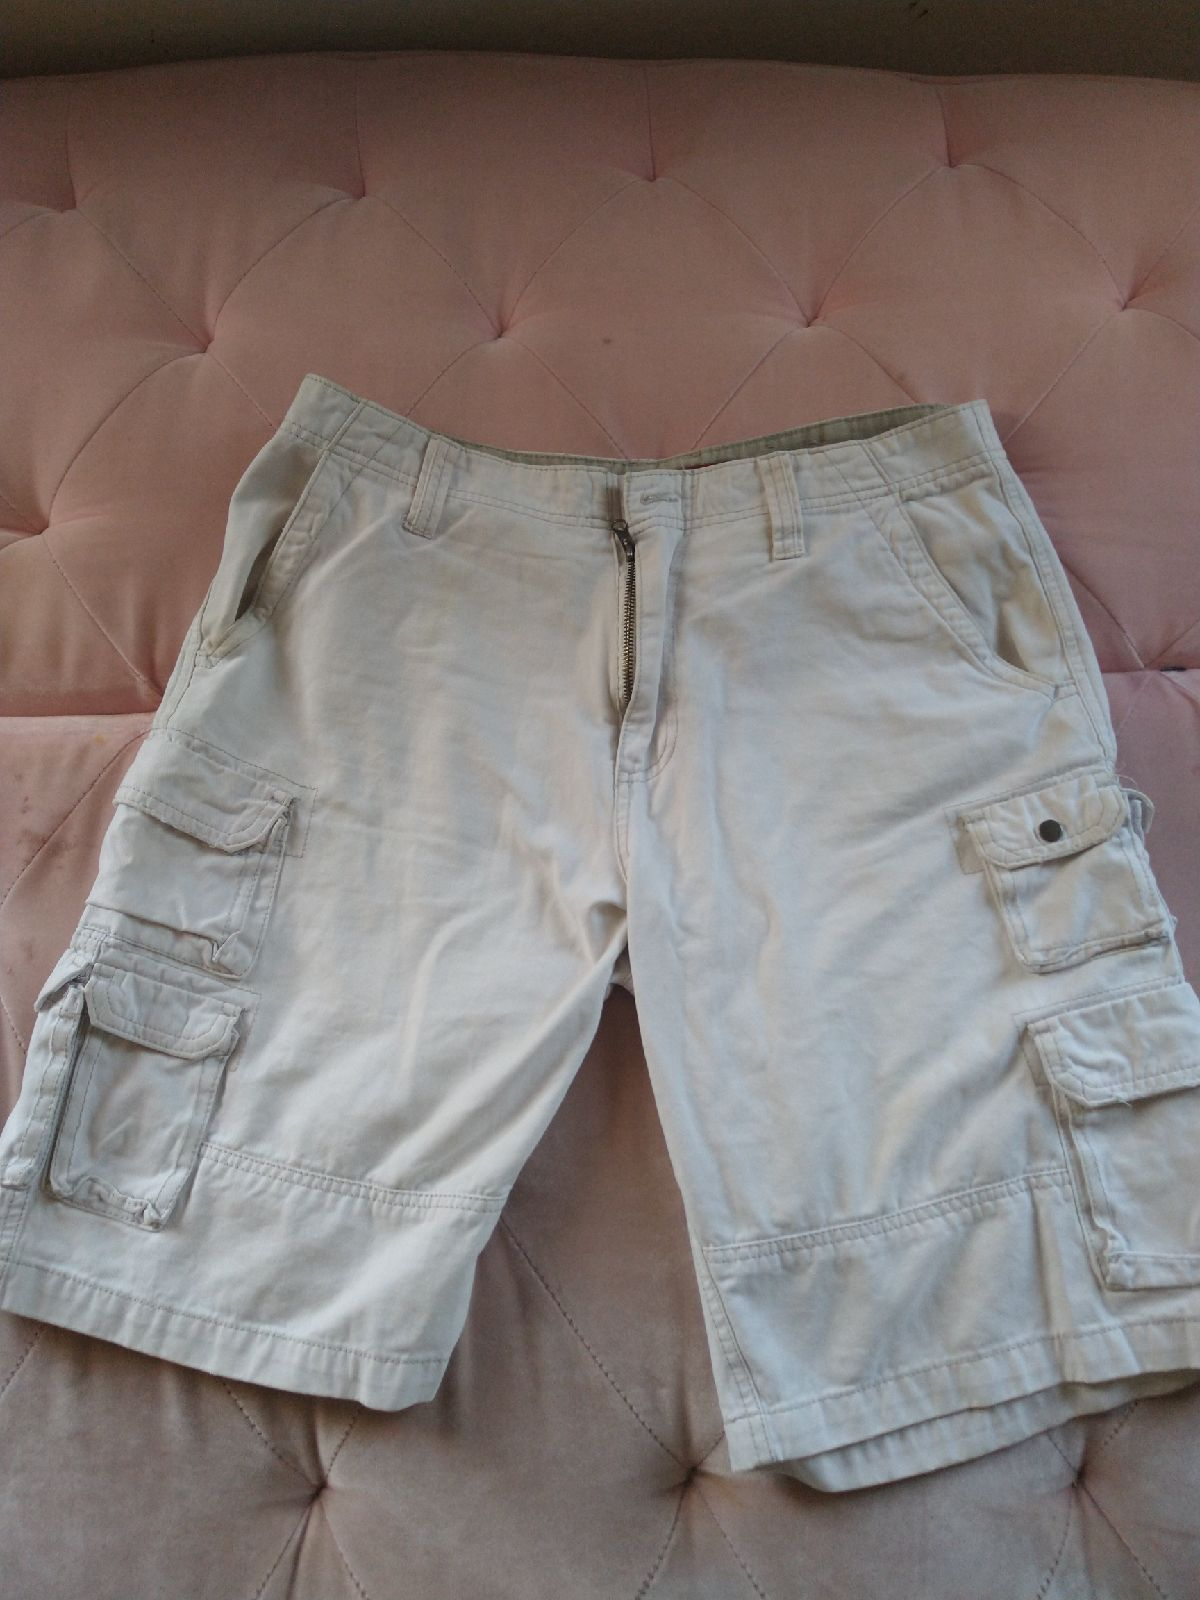 White Cargo Shorts Men